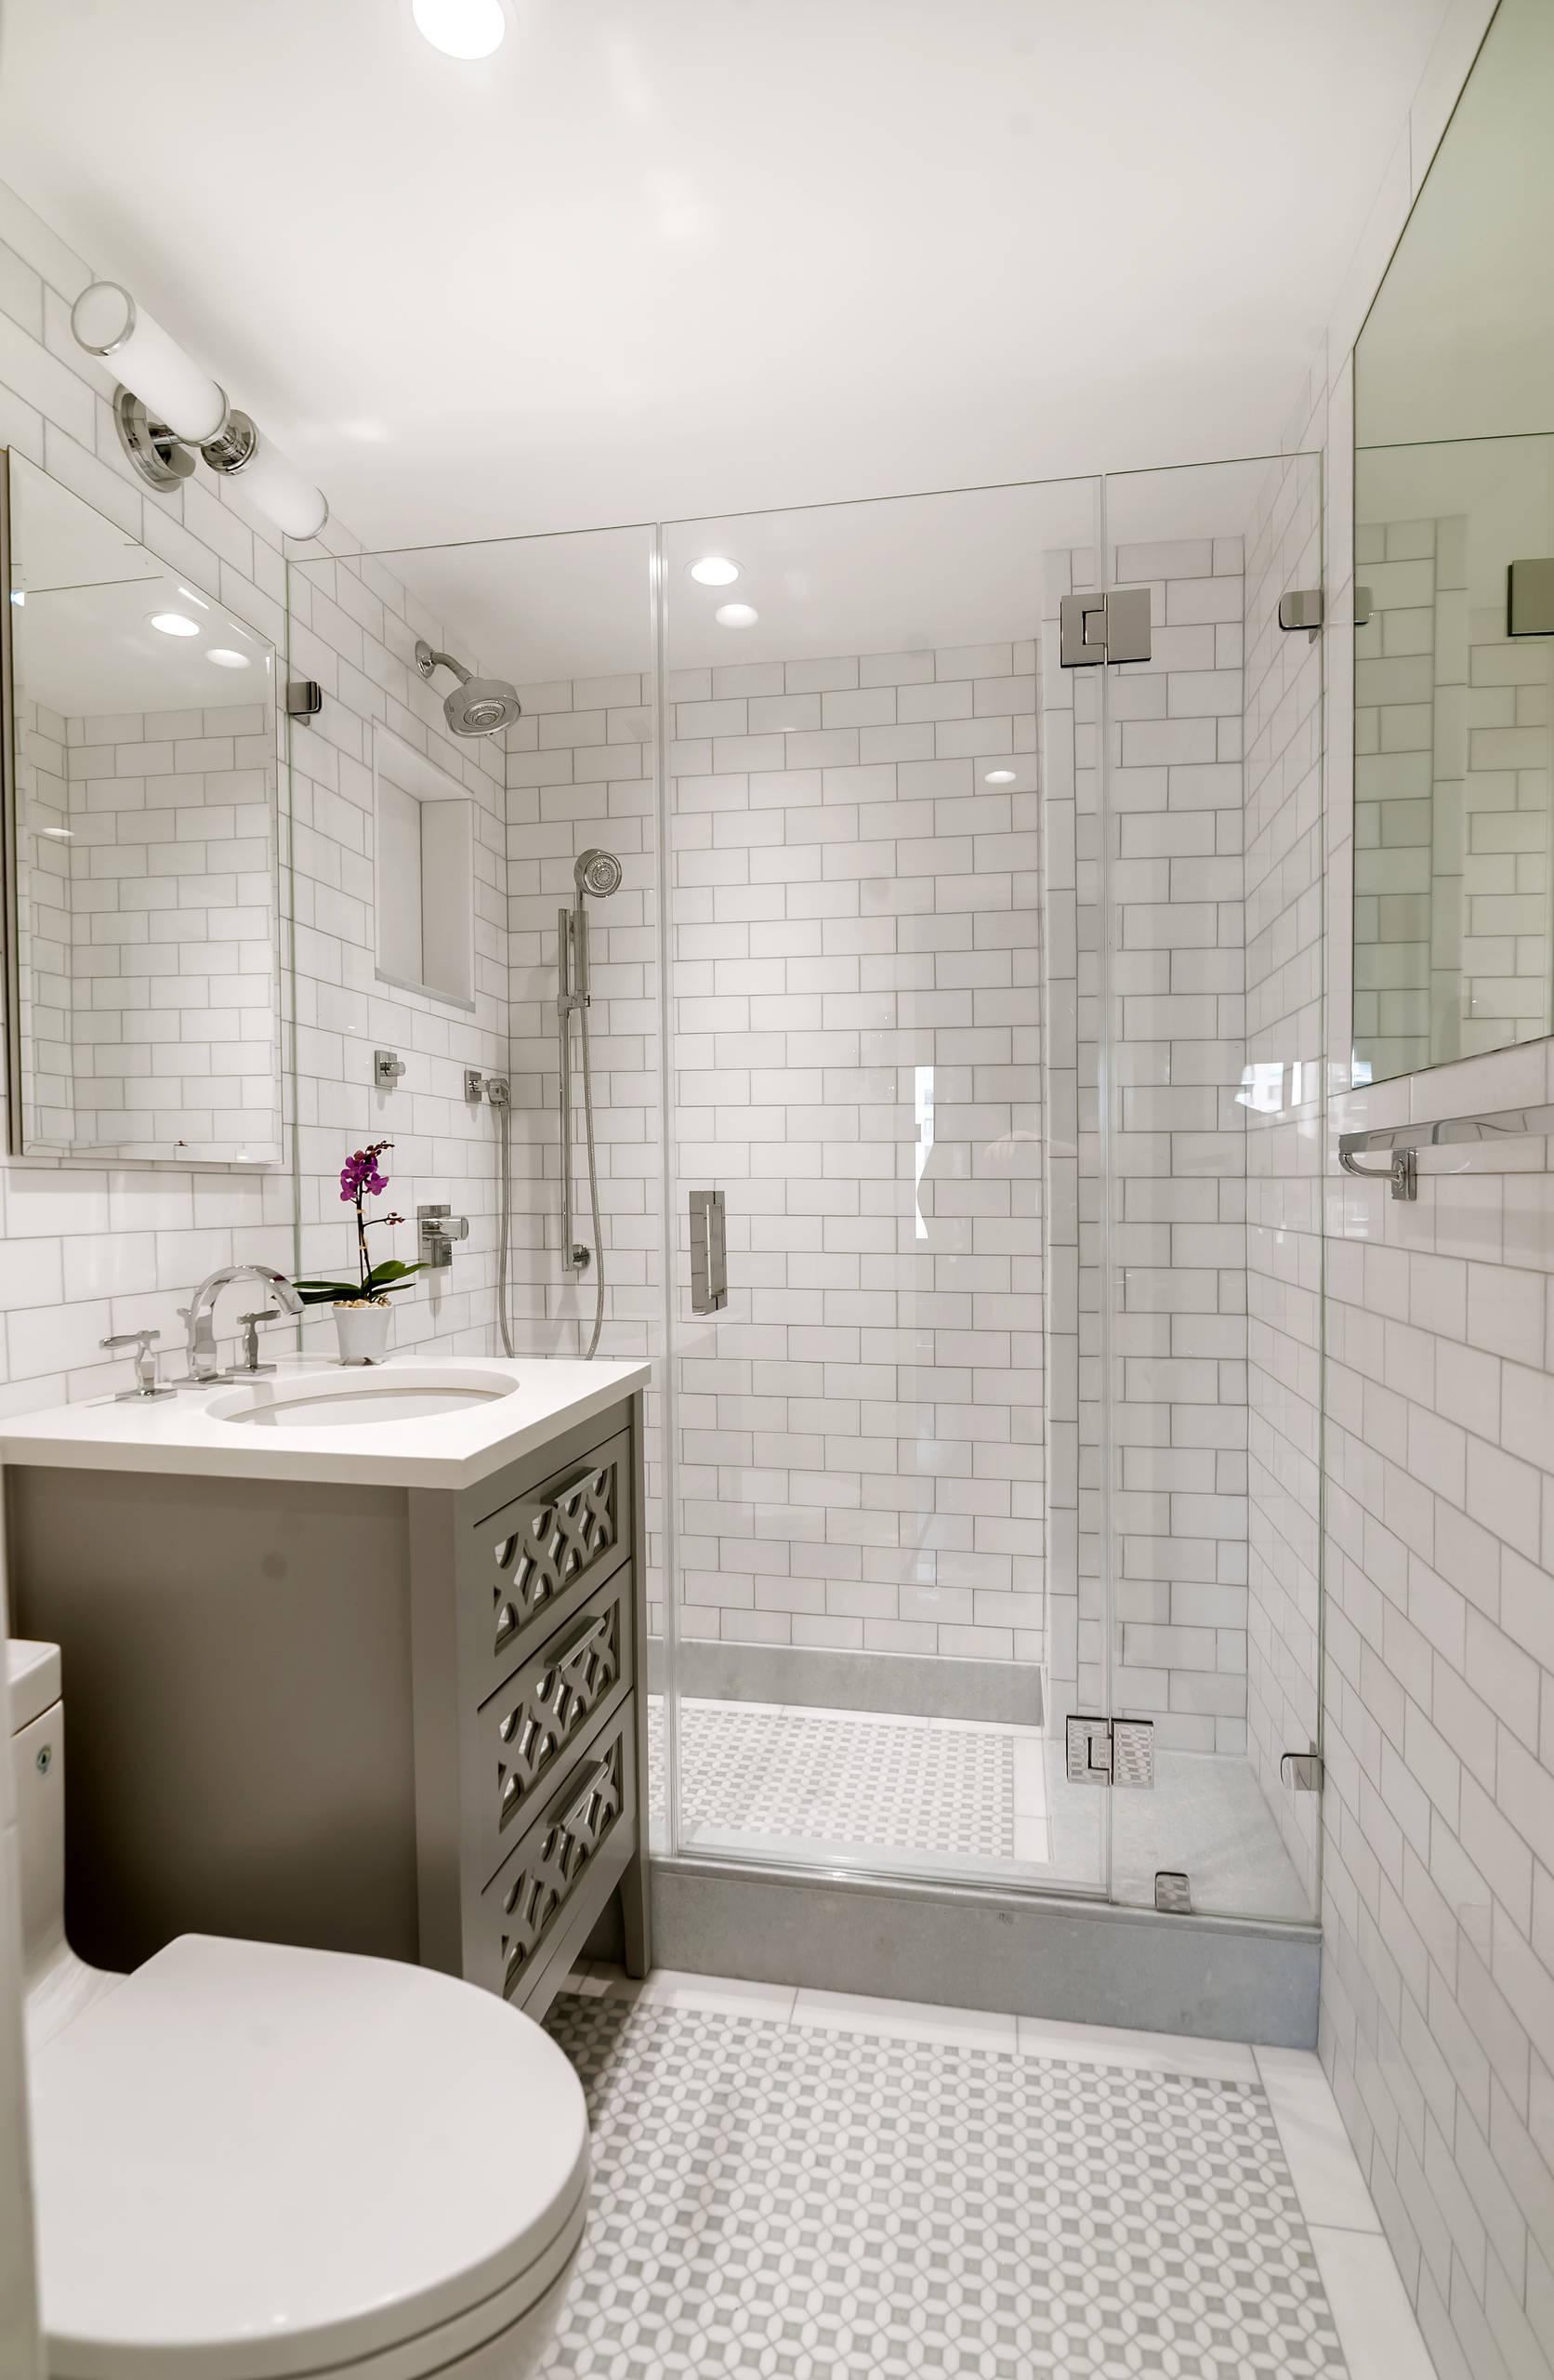 3x12 subway tile shower